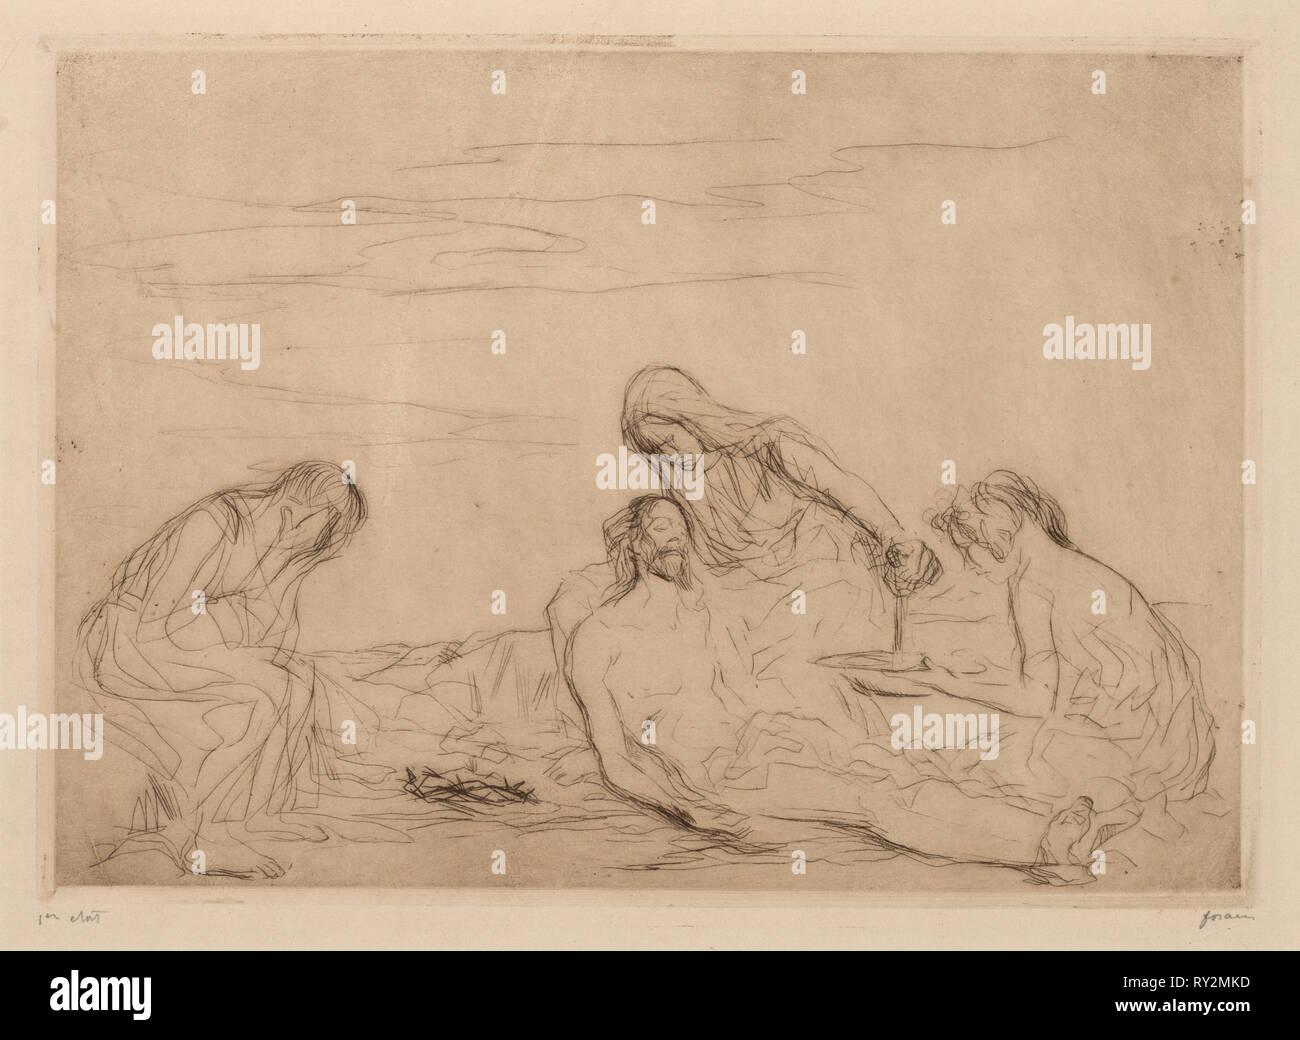 Pieta. Jean Louis Forain (French, 1852-1931). Etching - Stock Image